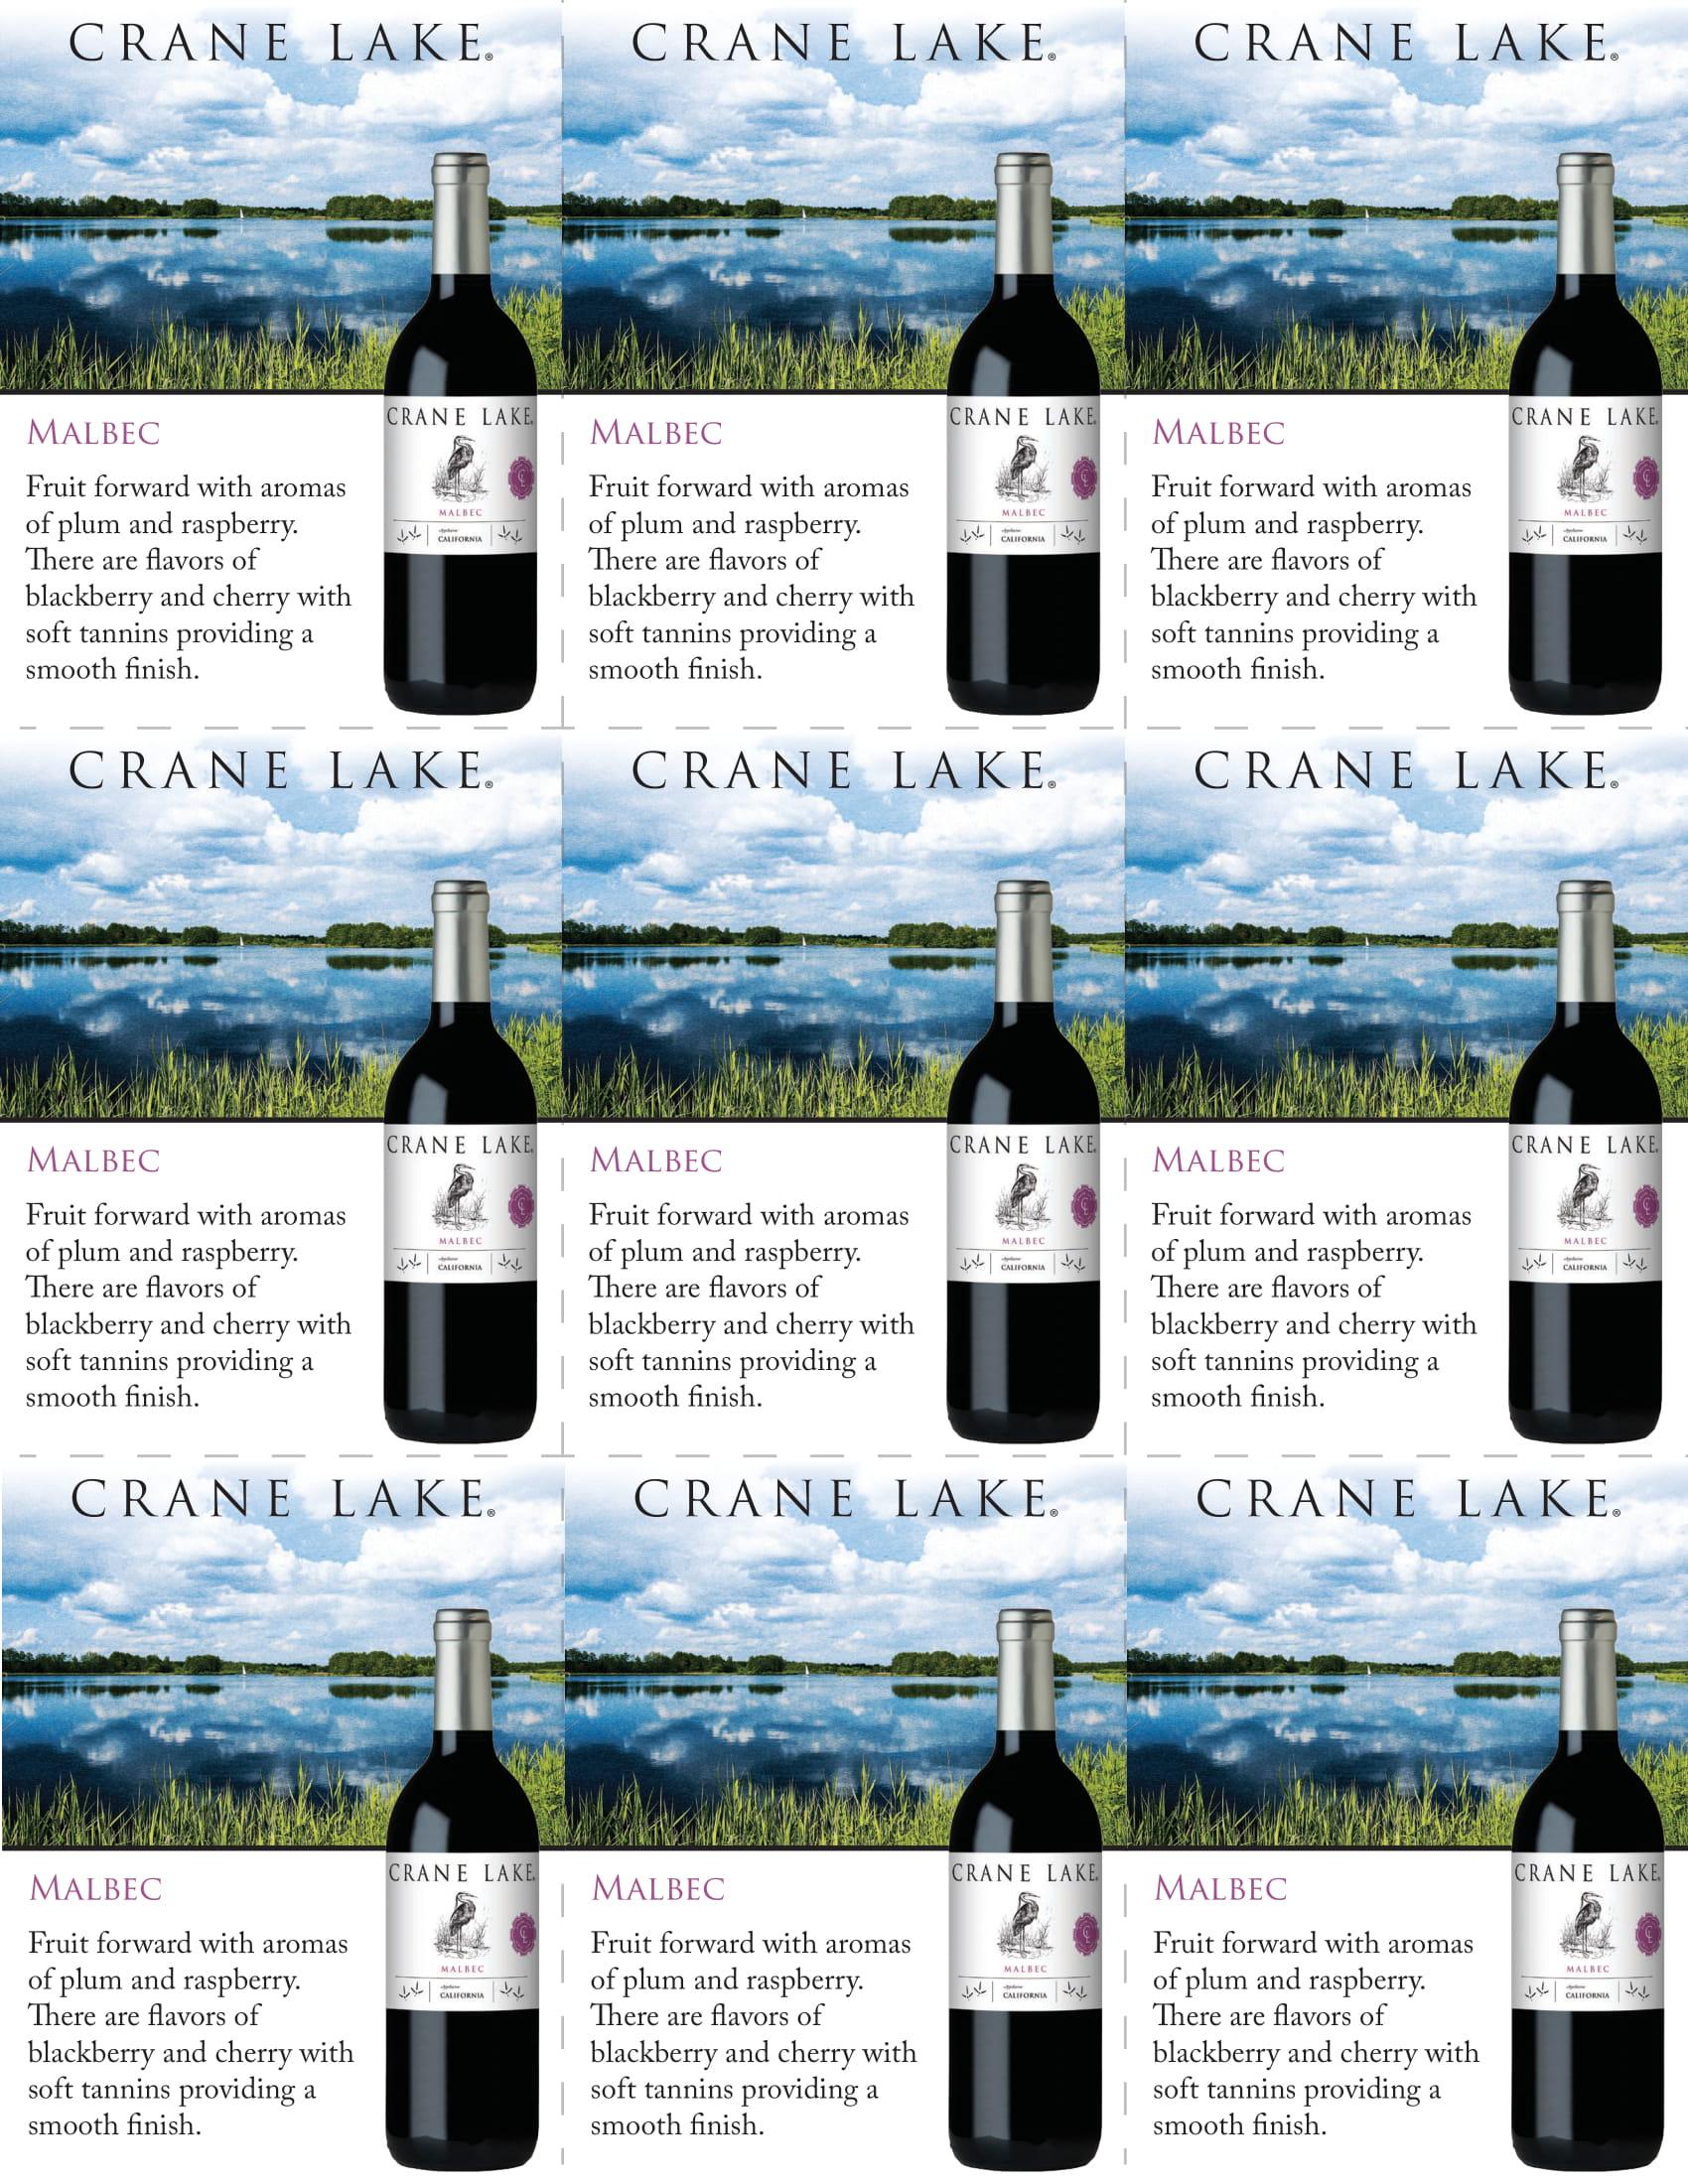 Crane Lake Malbec Shelf Talkers